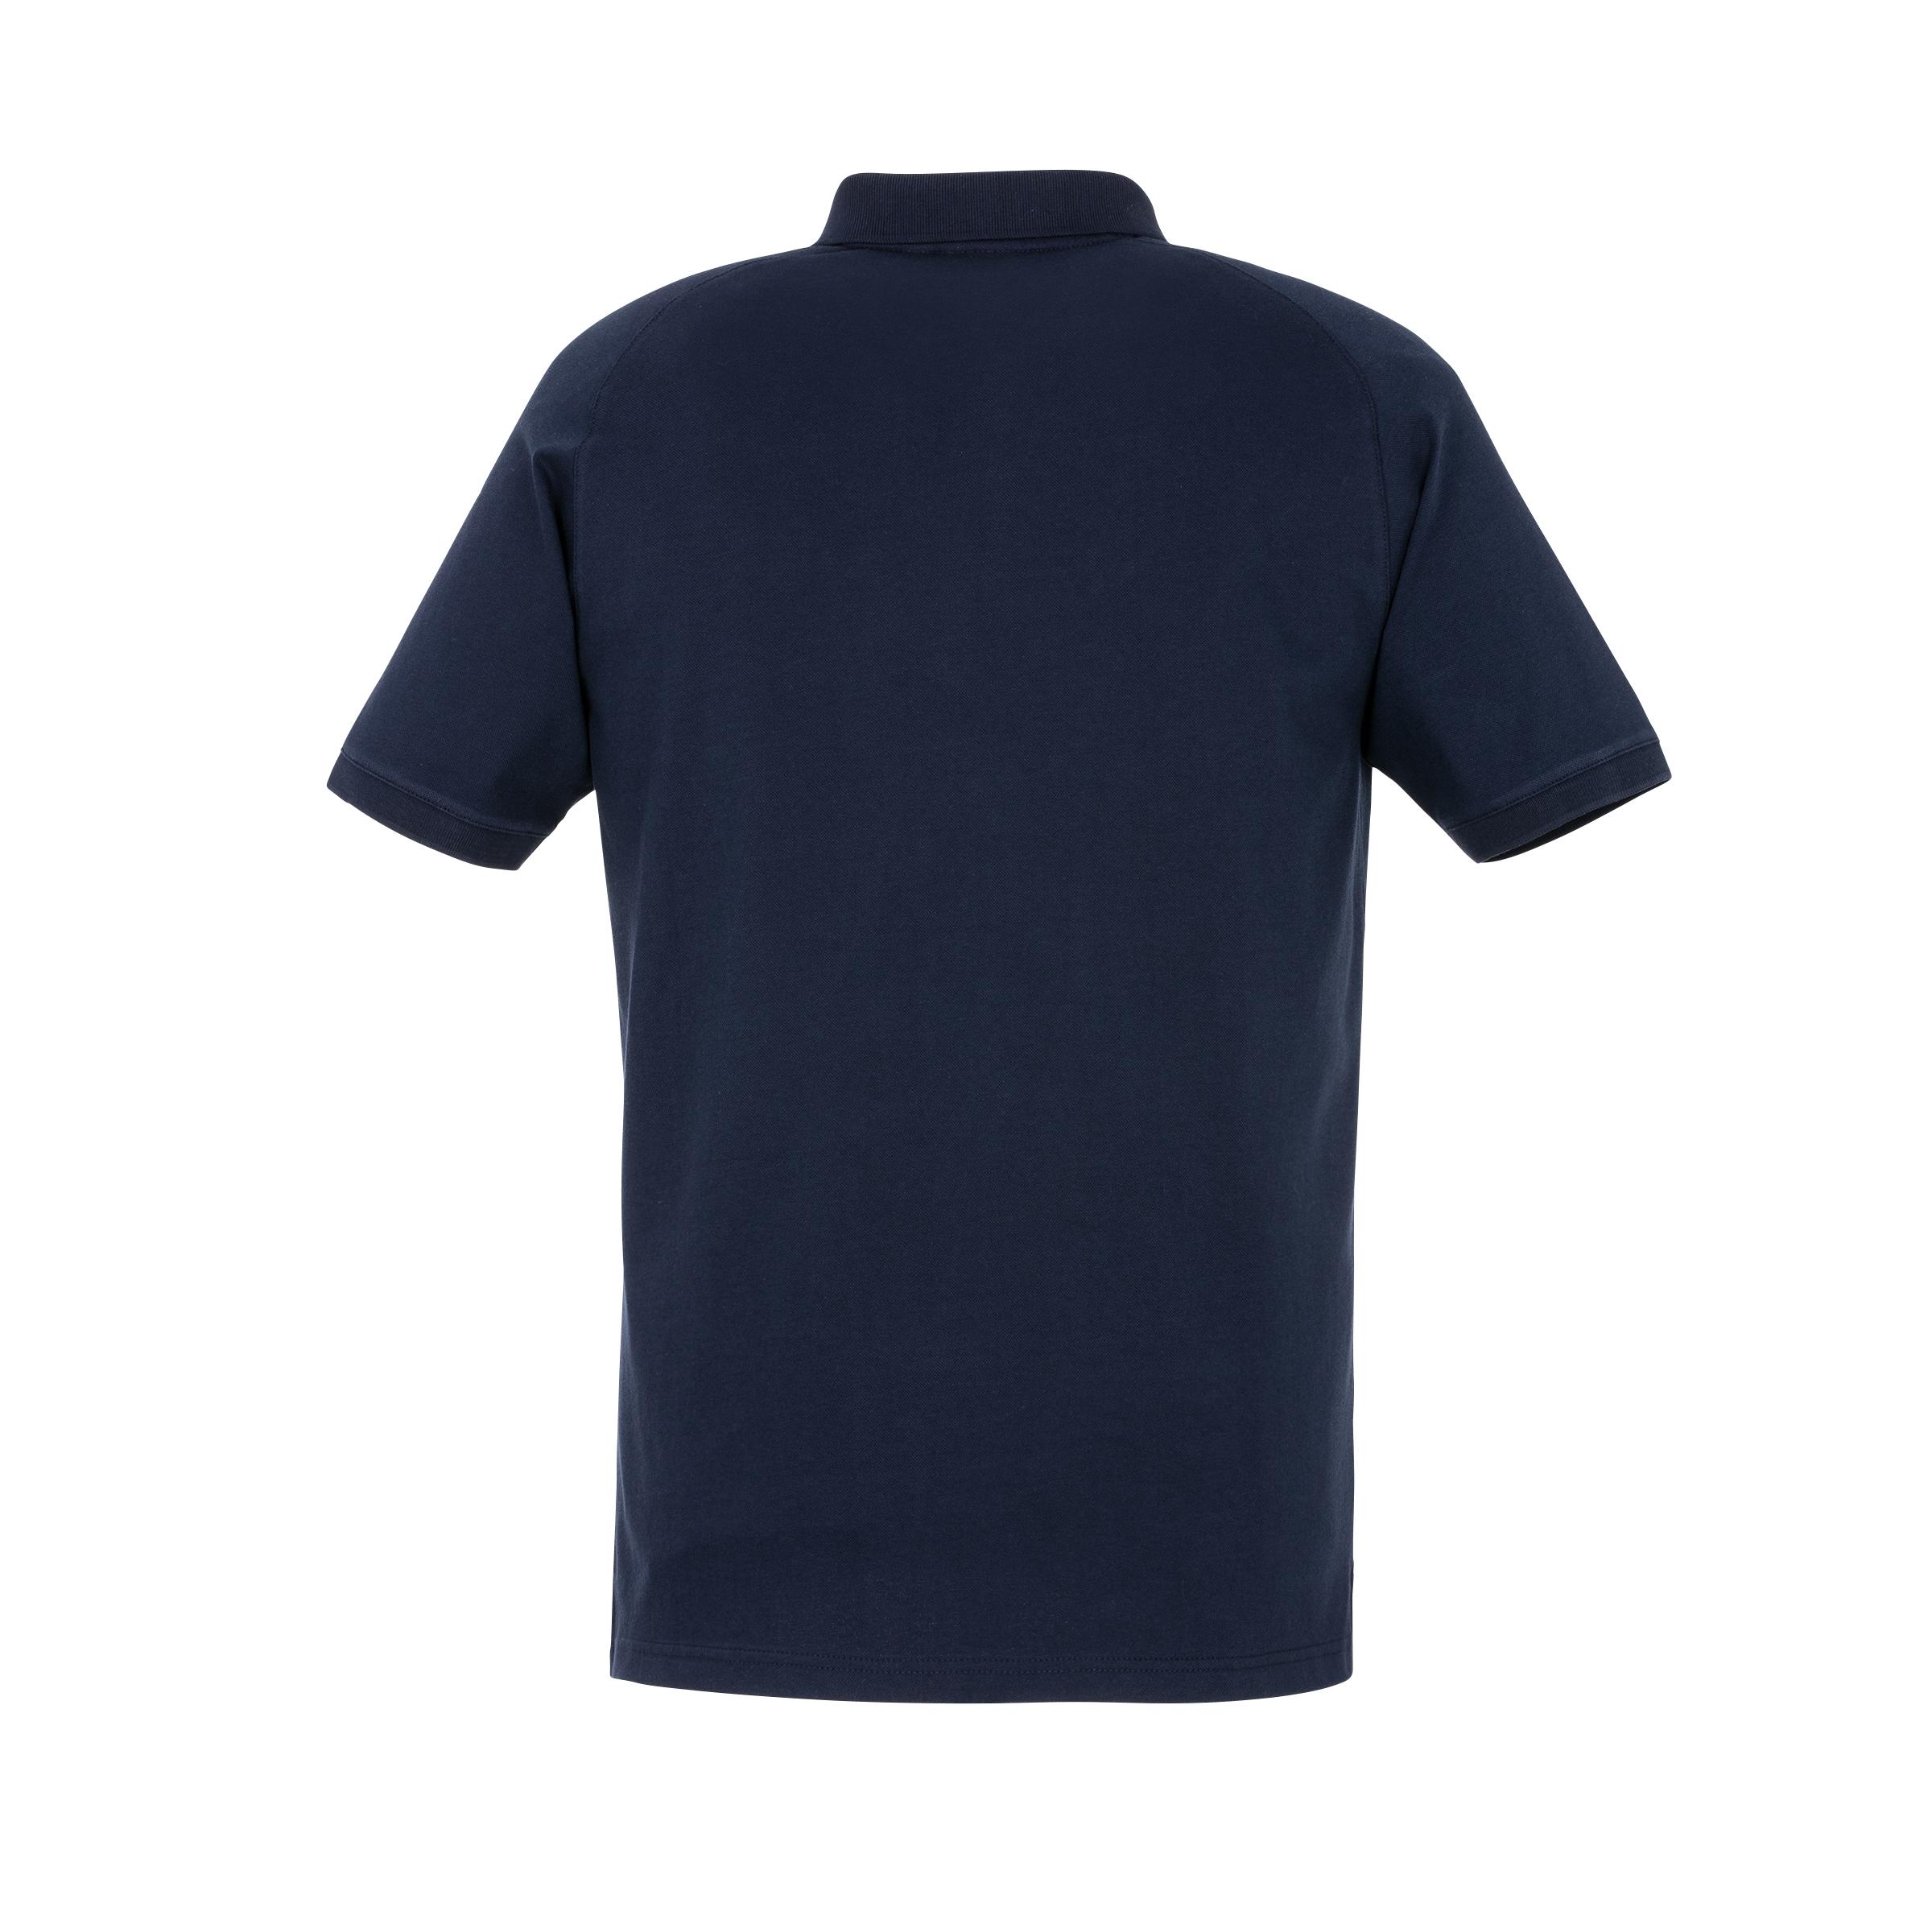 Audi Poloshirt Herren Größe 2XL navy blau